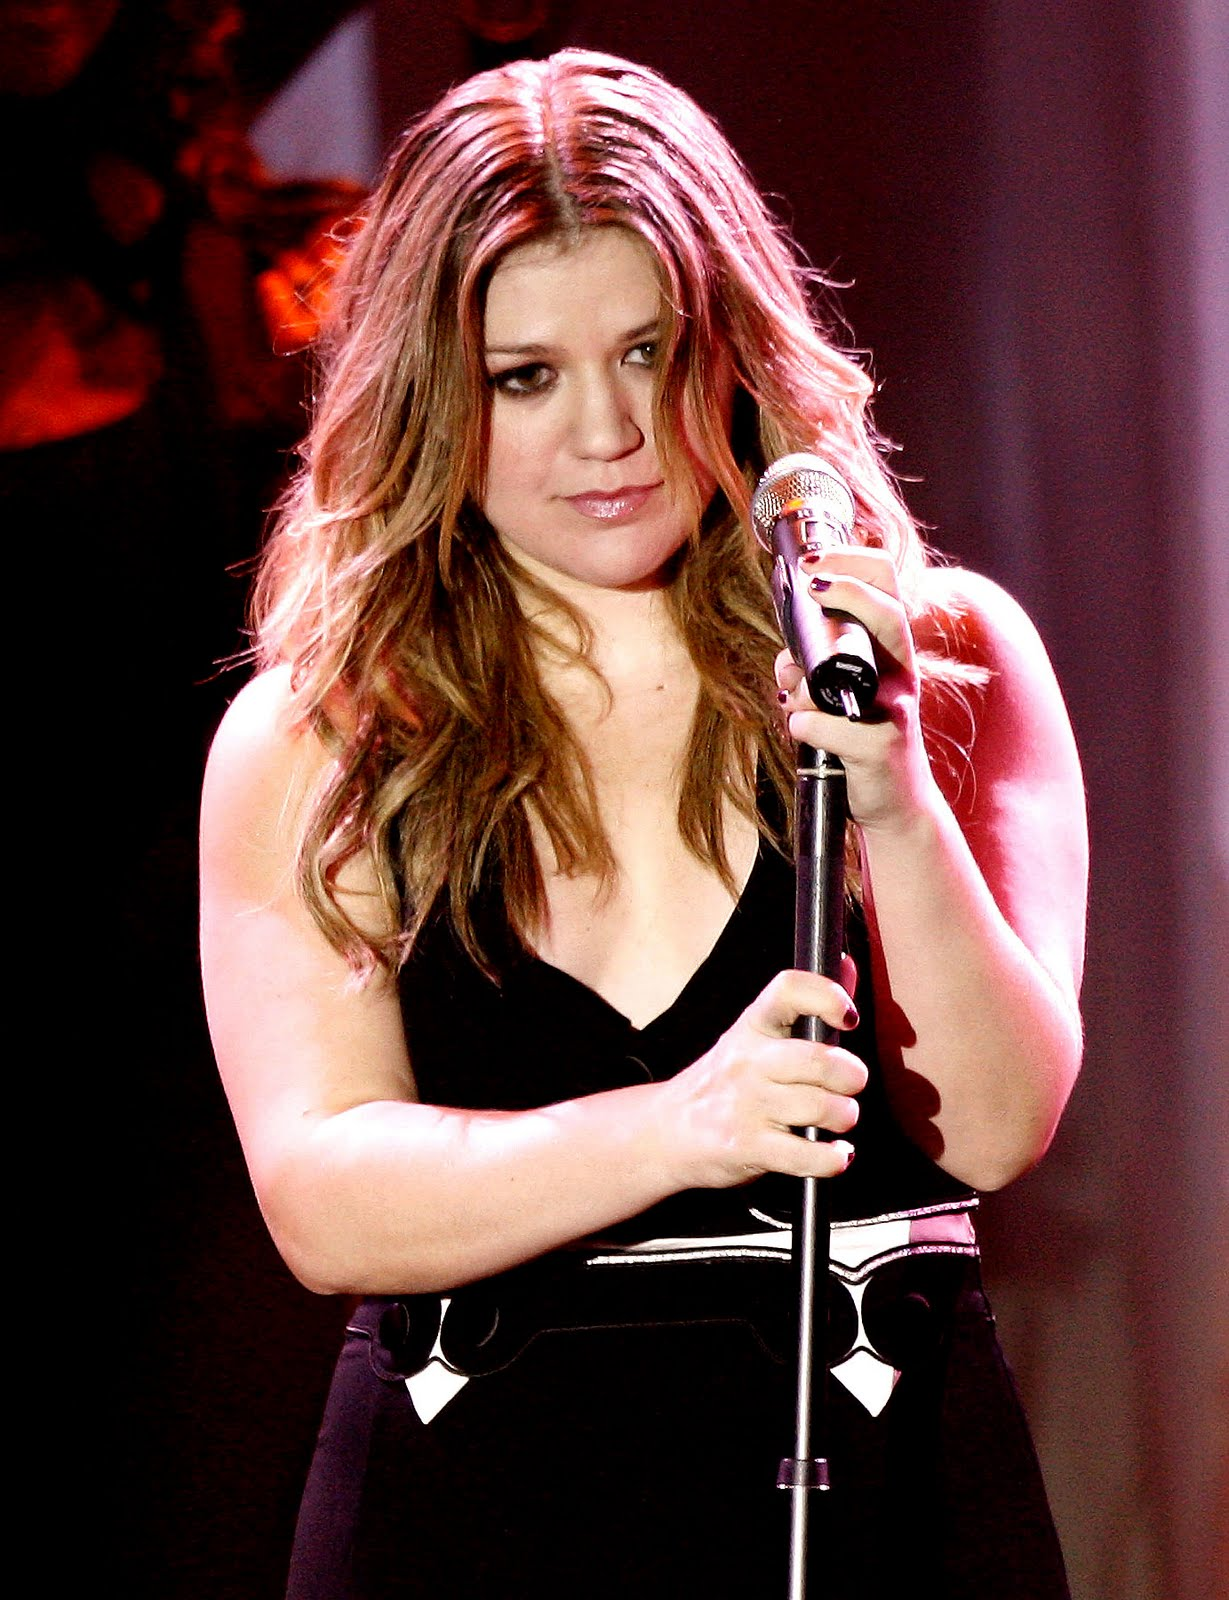 http://1.bp.blogspot.com/-h2hEB5h0sXs/TlDgT59SEDI/AAAAAAAAAA8/2Ej2Mj3wVkk/s1600/Kelly-Clarkson-life-style-2011-american-singer-and-actress-10.jpg